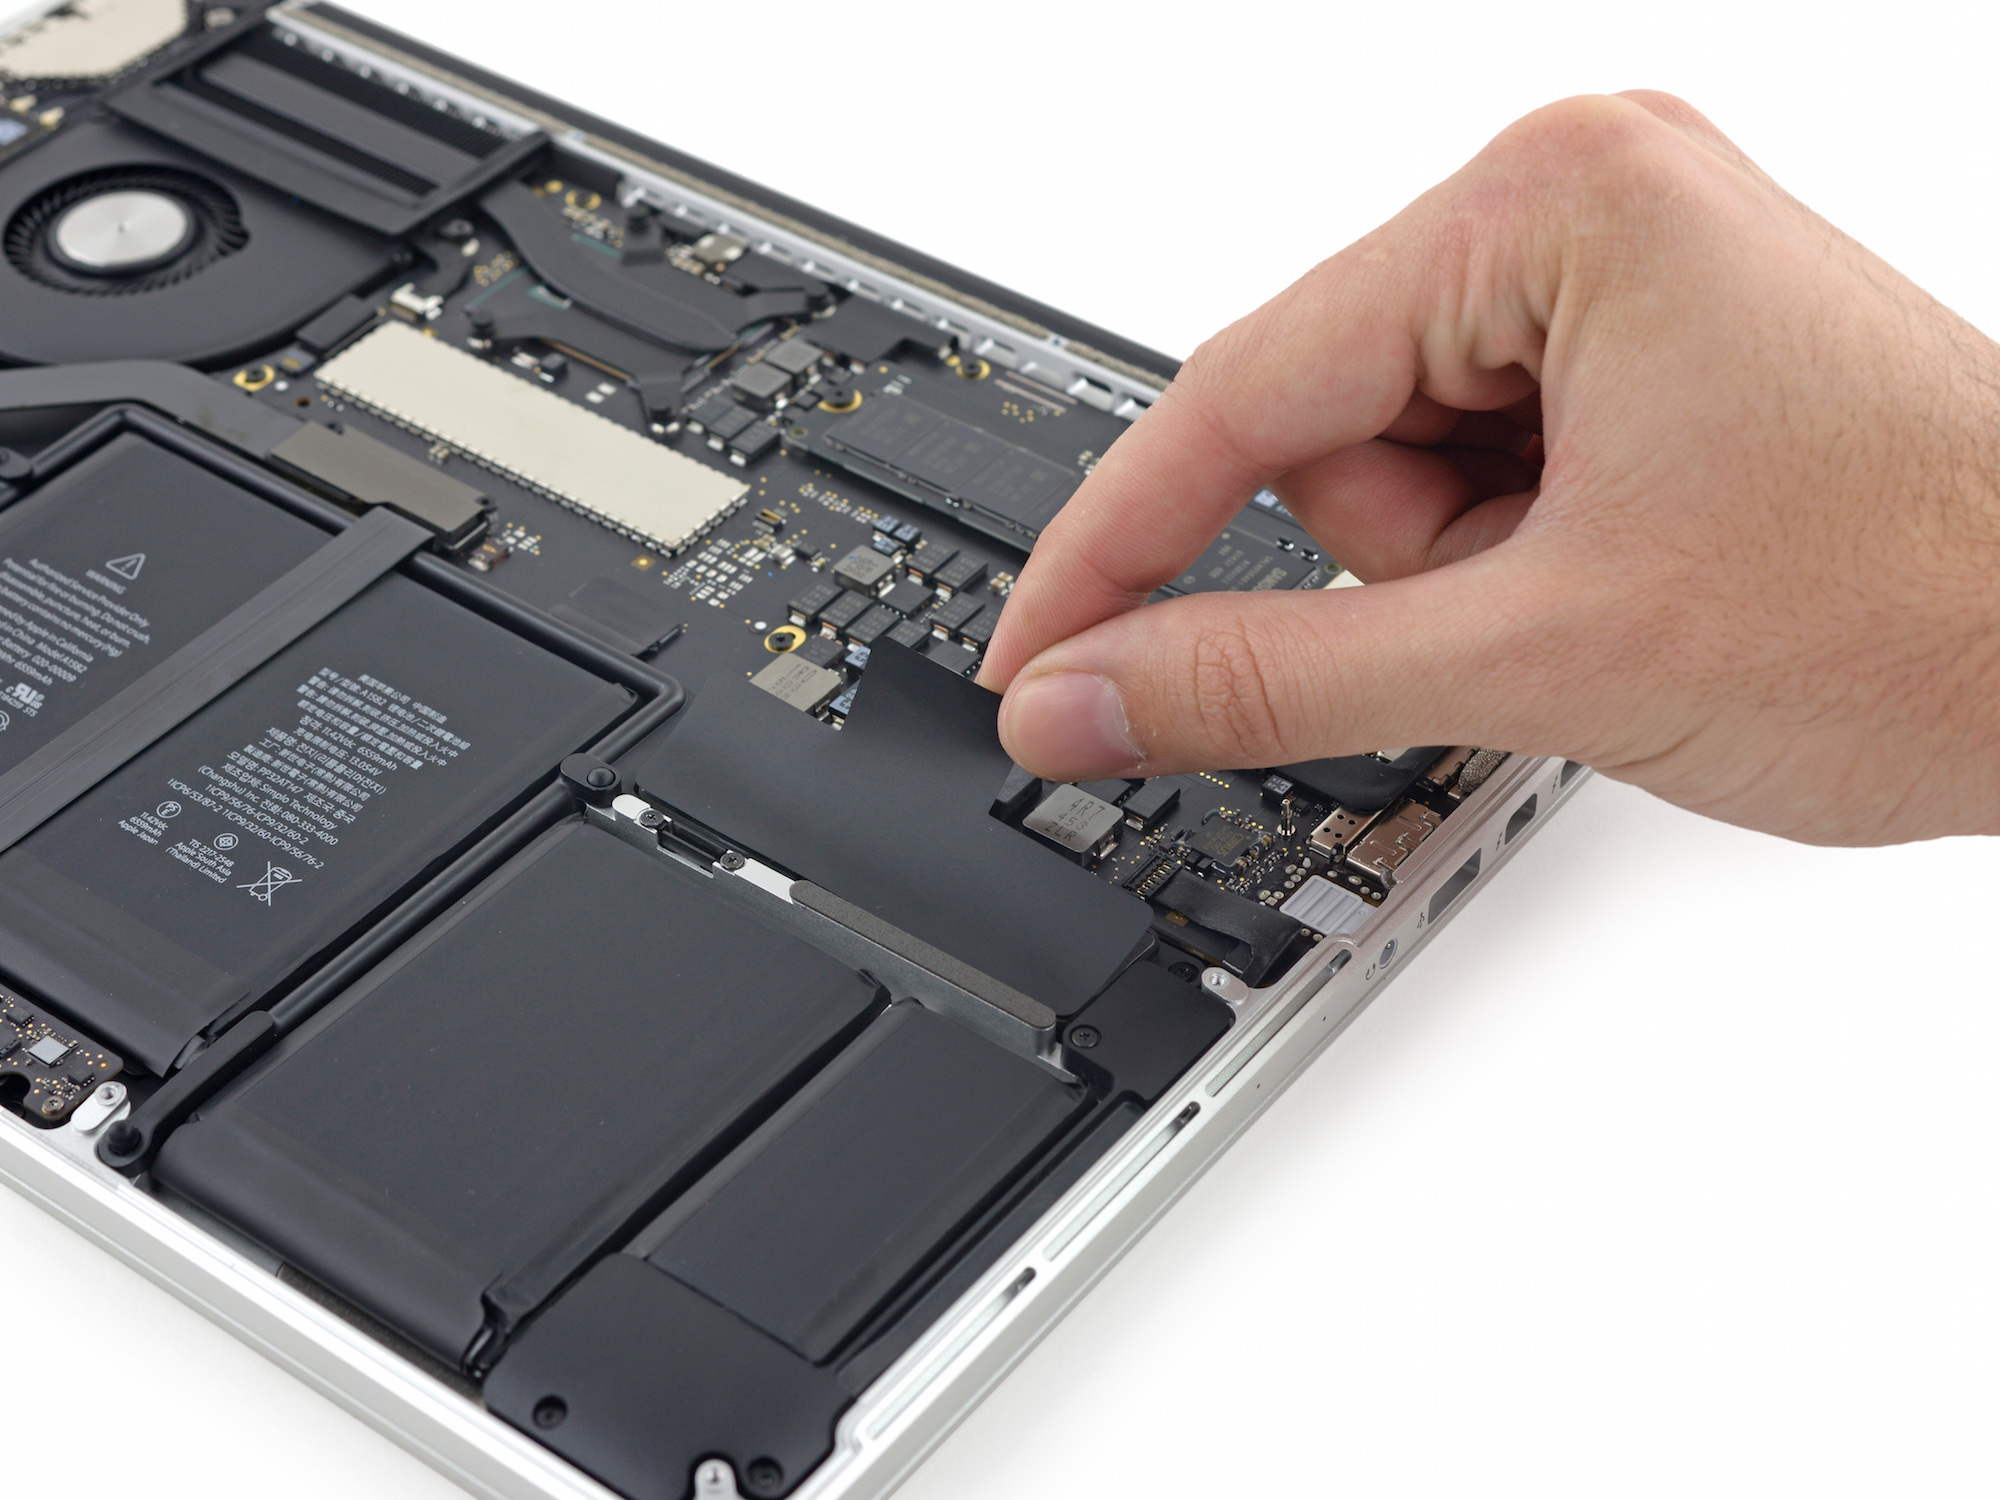 E-mmop : Reparation iPhone, Mac